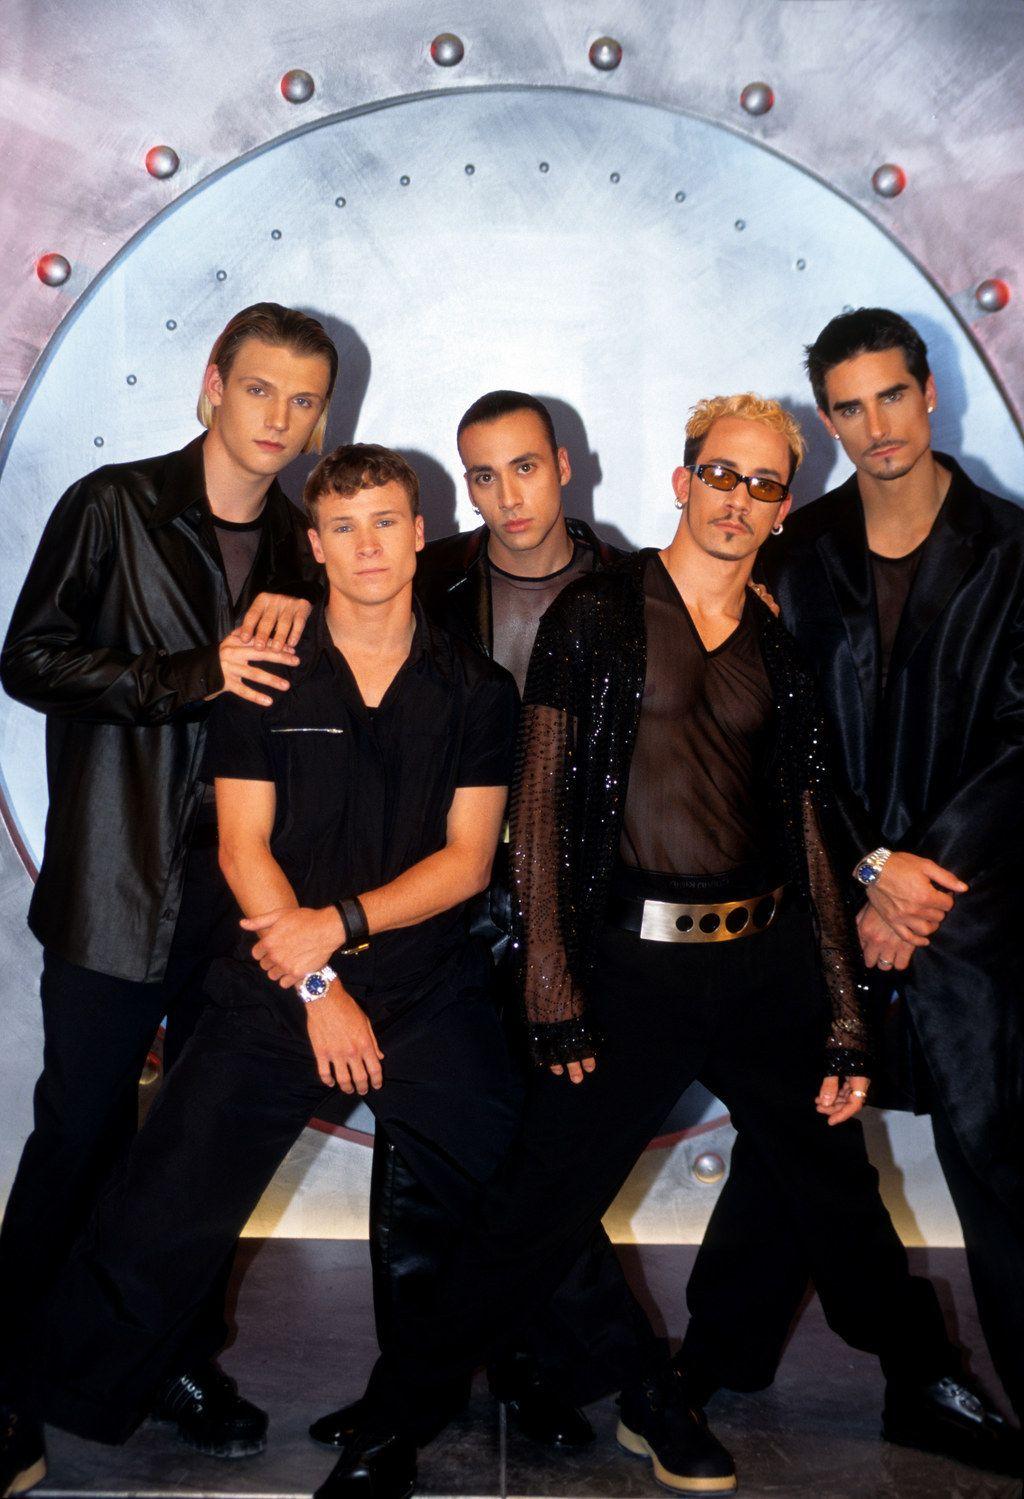 The backstreet boys are gay — 10